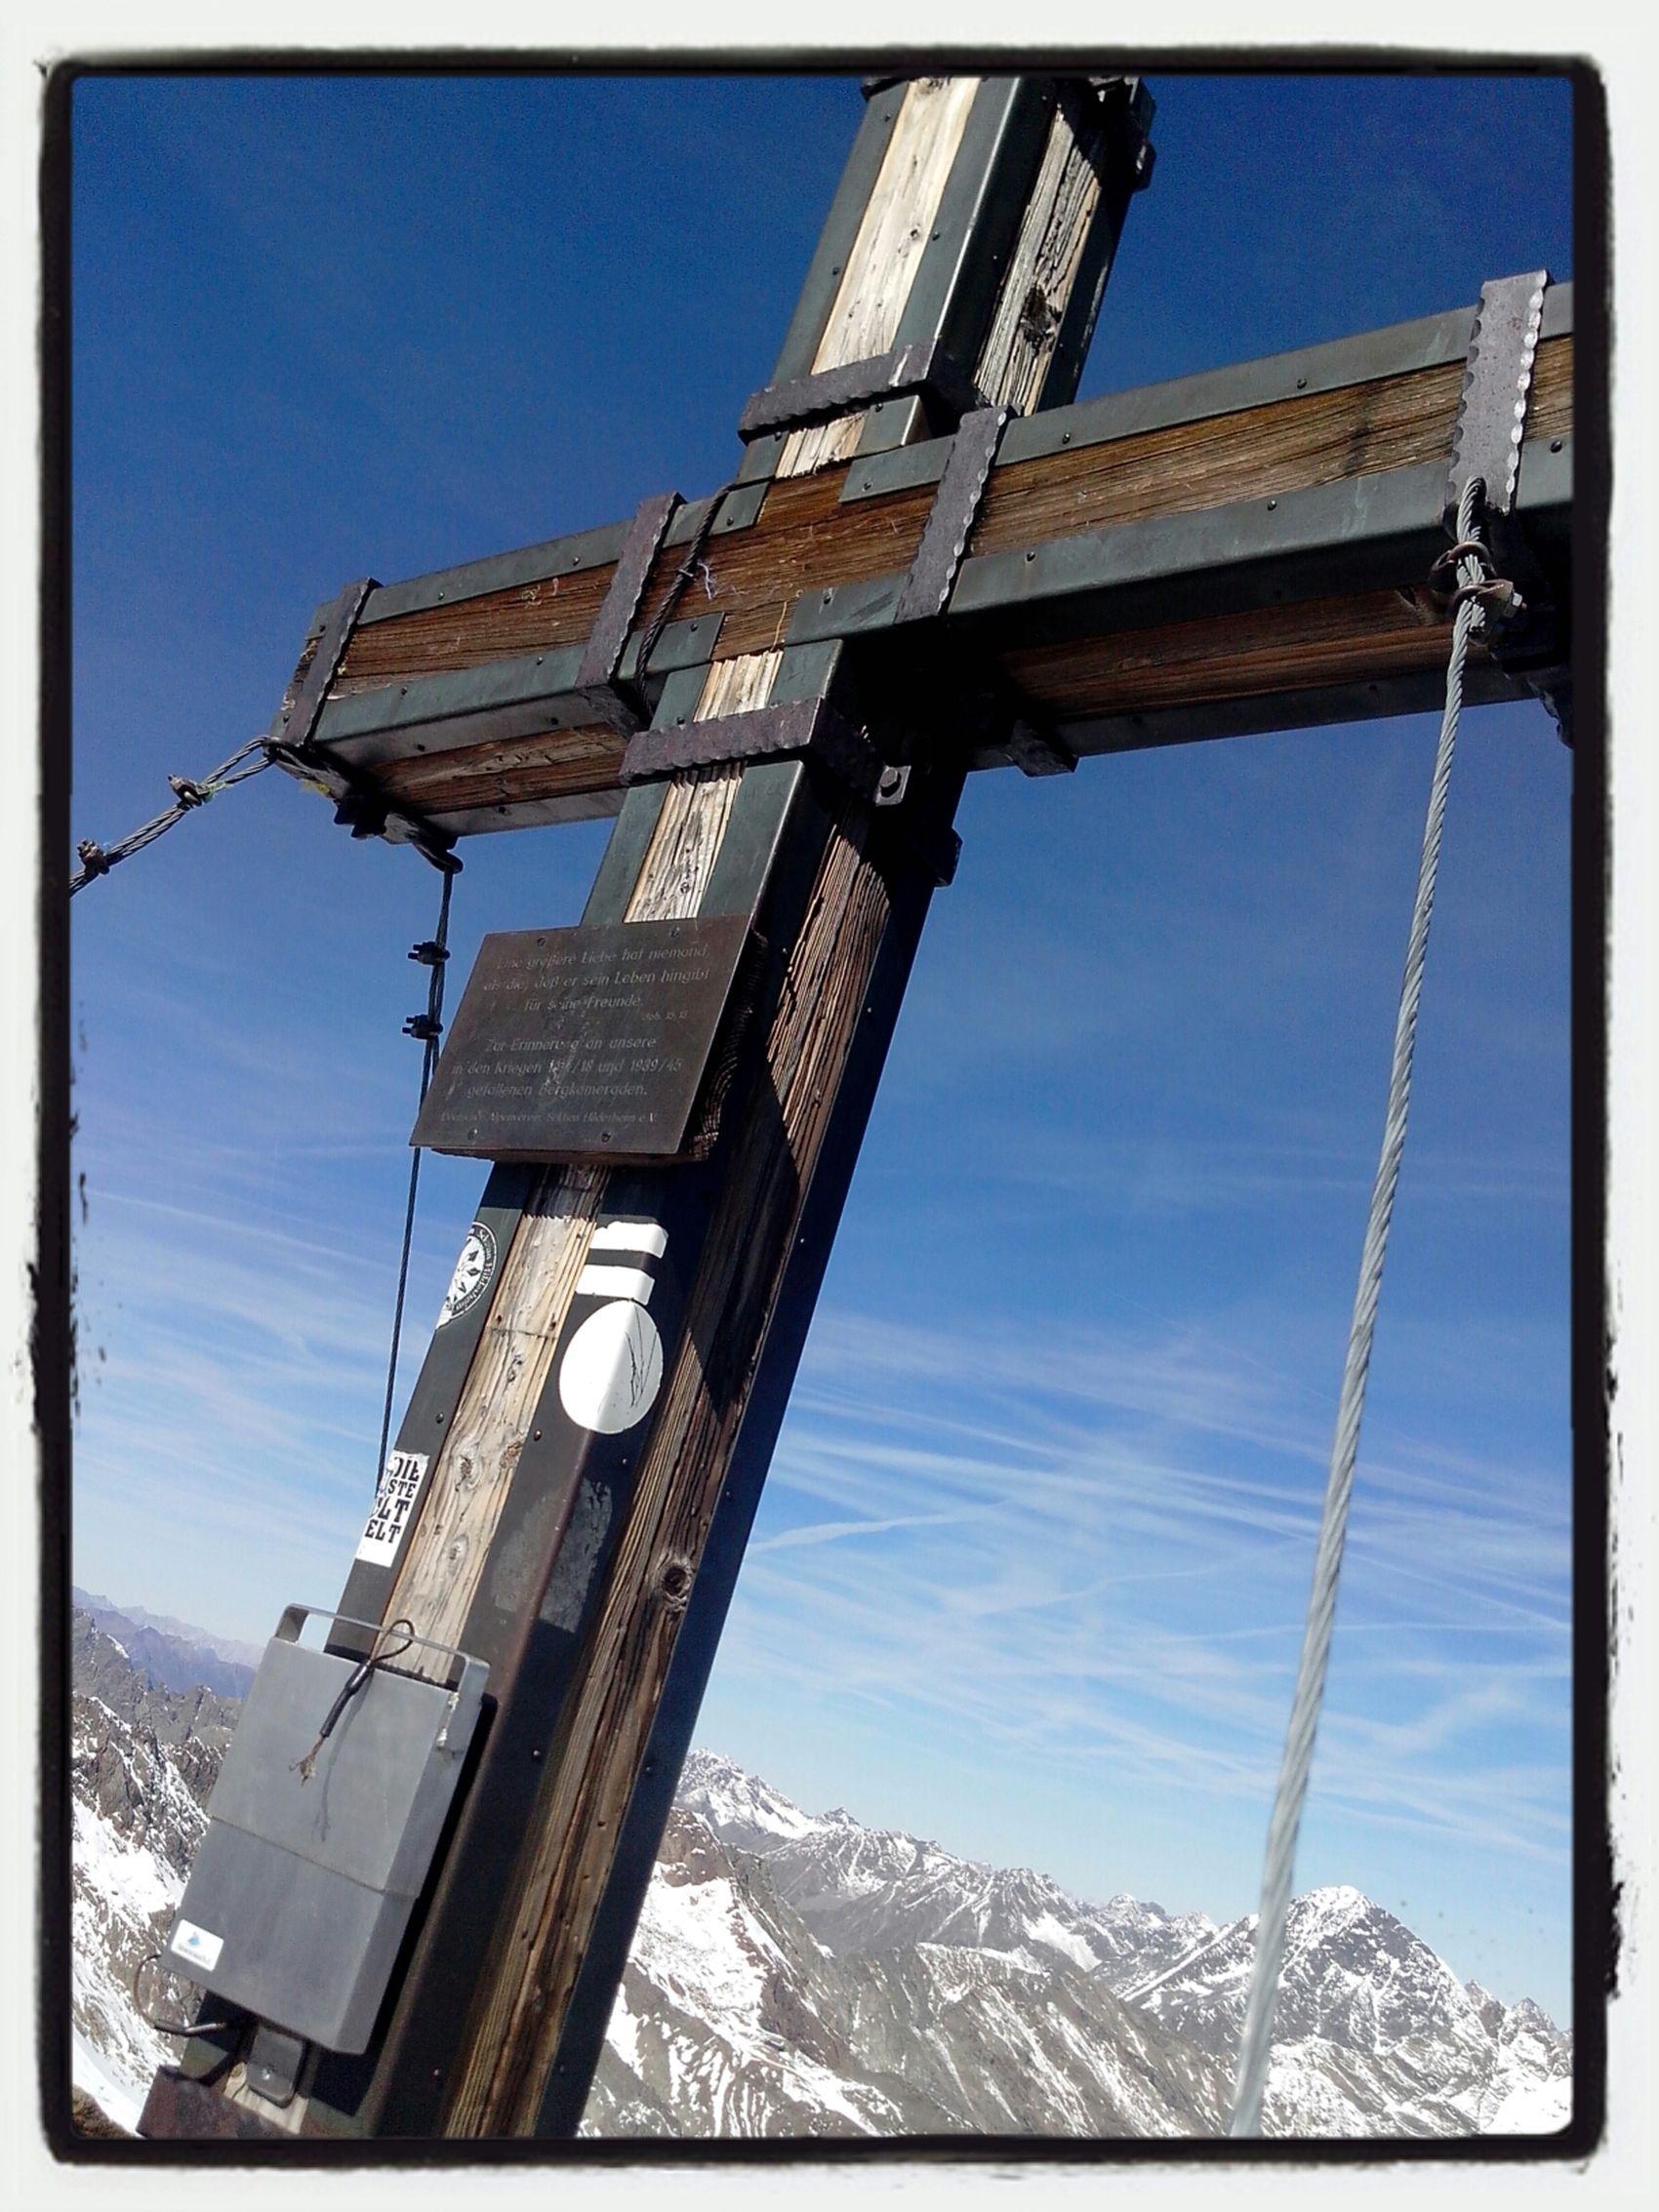 Schaufelspitze (3.332m) Gipfelkreuz Stubai Glacier AMPt - My Perspective